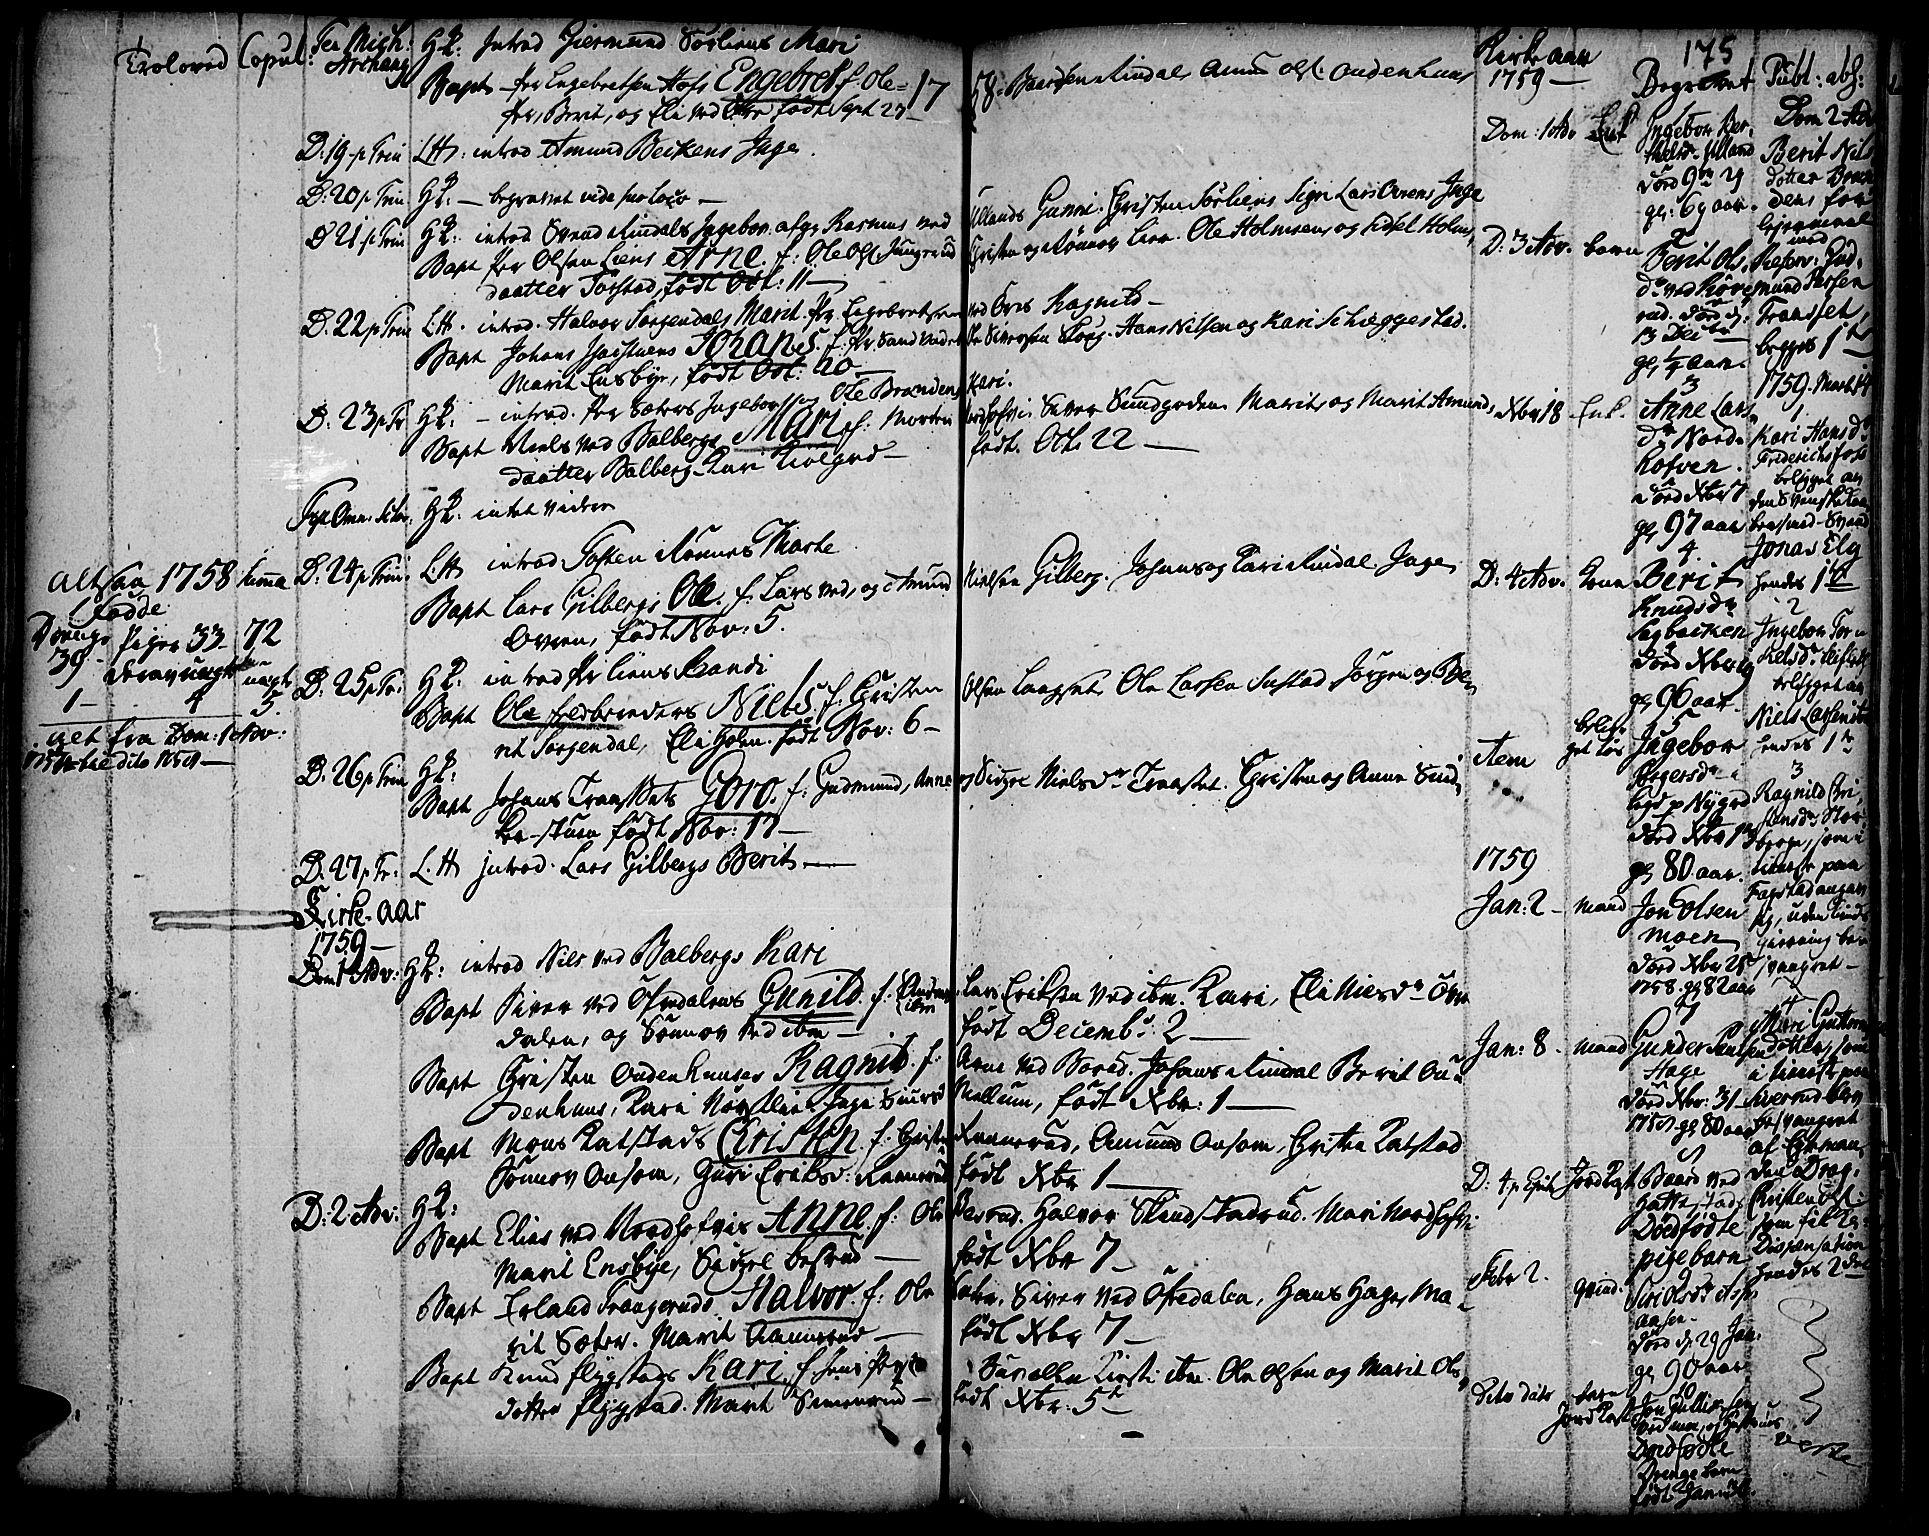 SAH, Fåberg prestekontor, Ministerialbok nr. 1, 1727-1775, s. 175